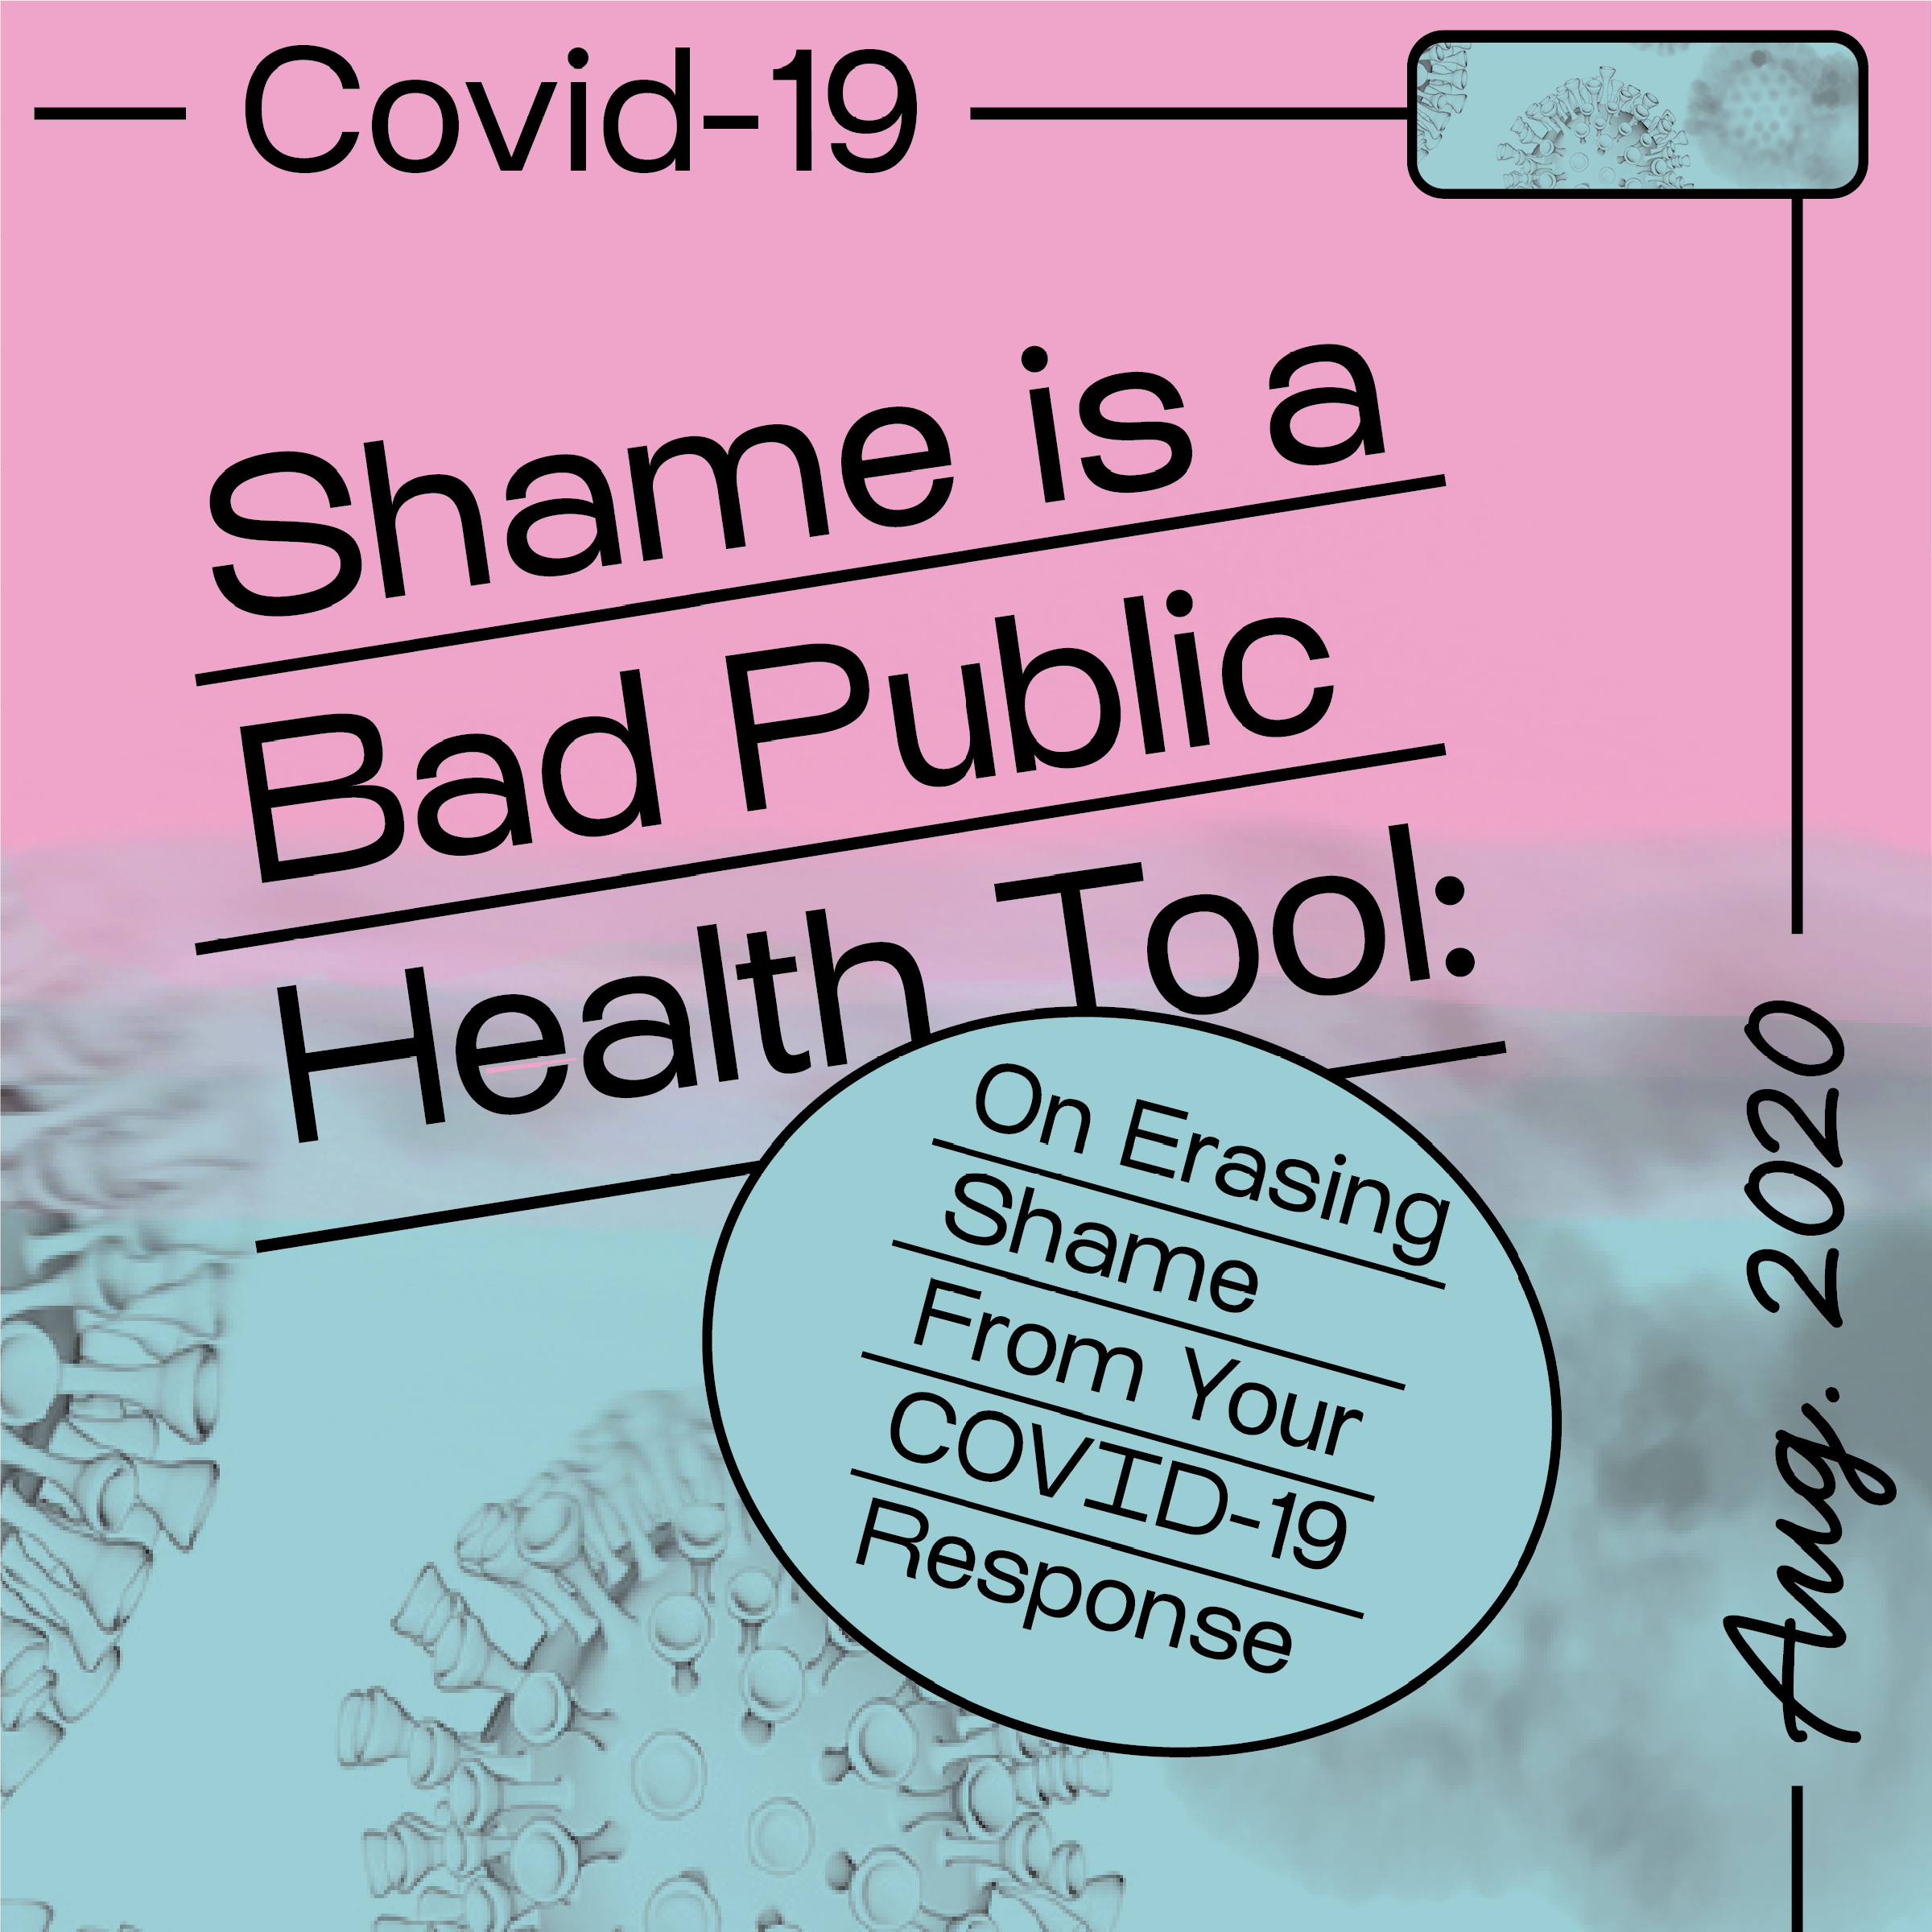 COVID-19 Action & Informative Design Series